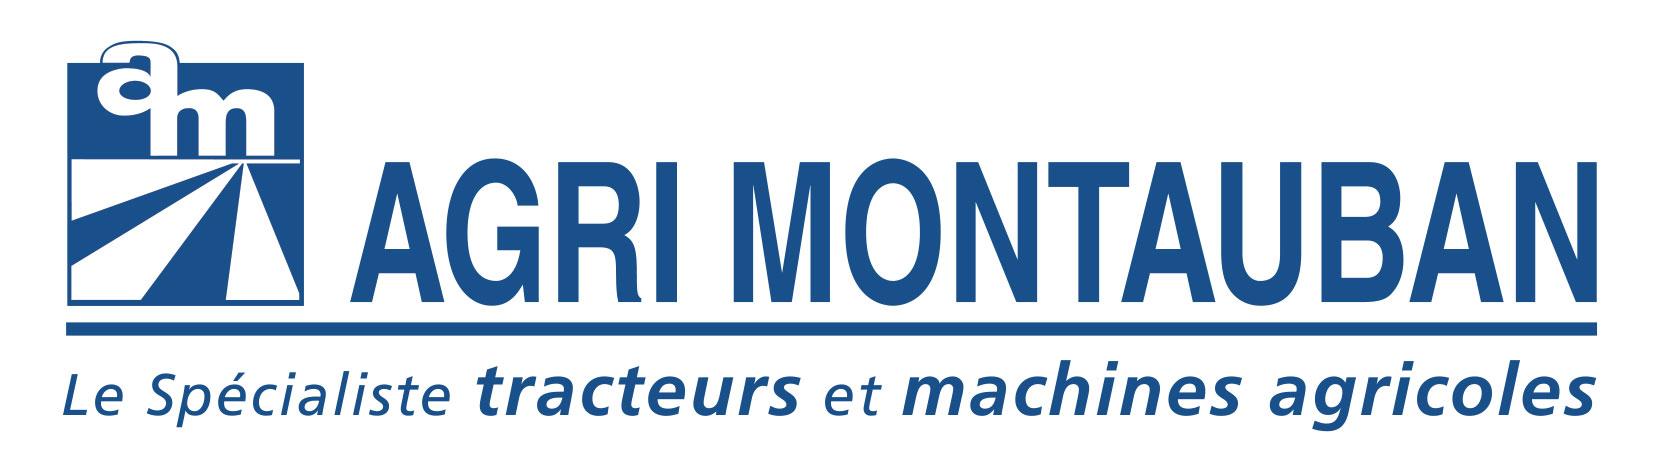 Agri Montauban